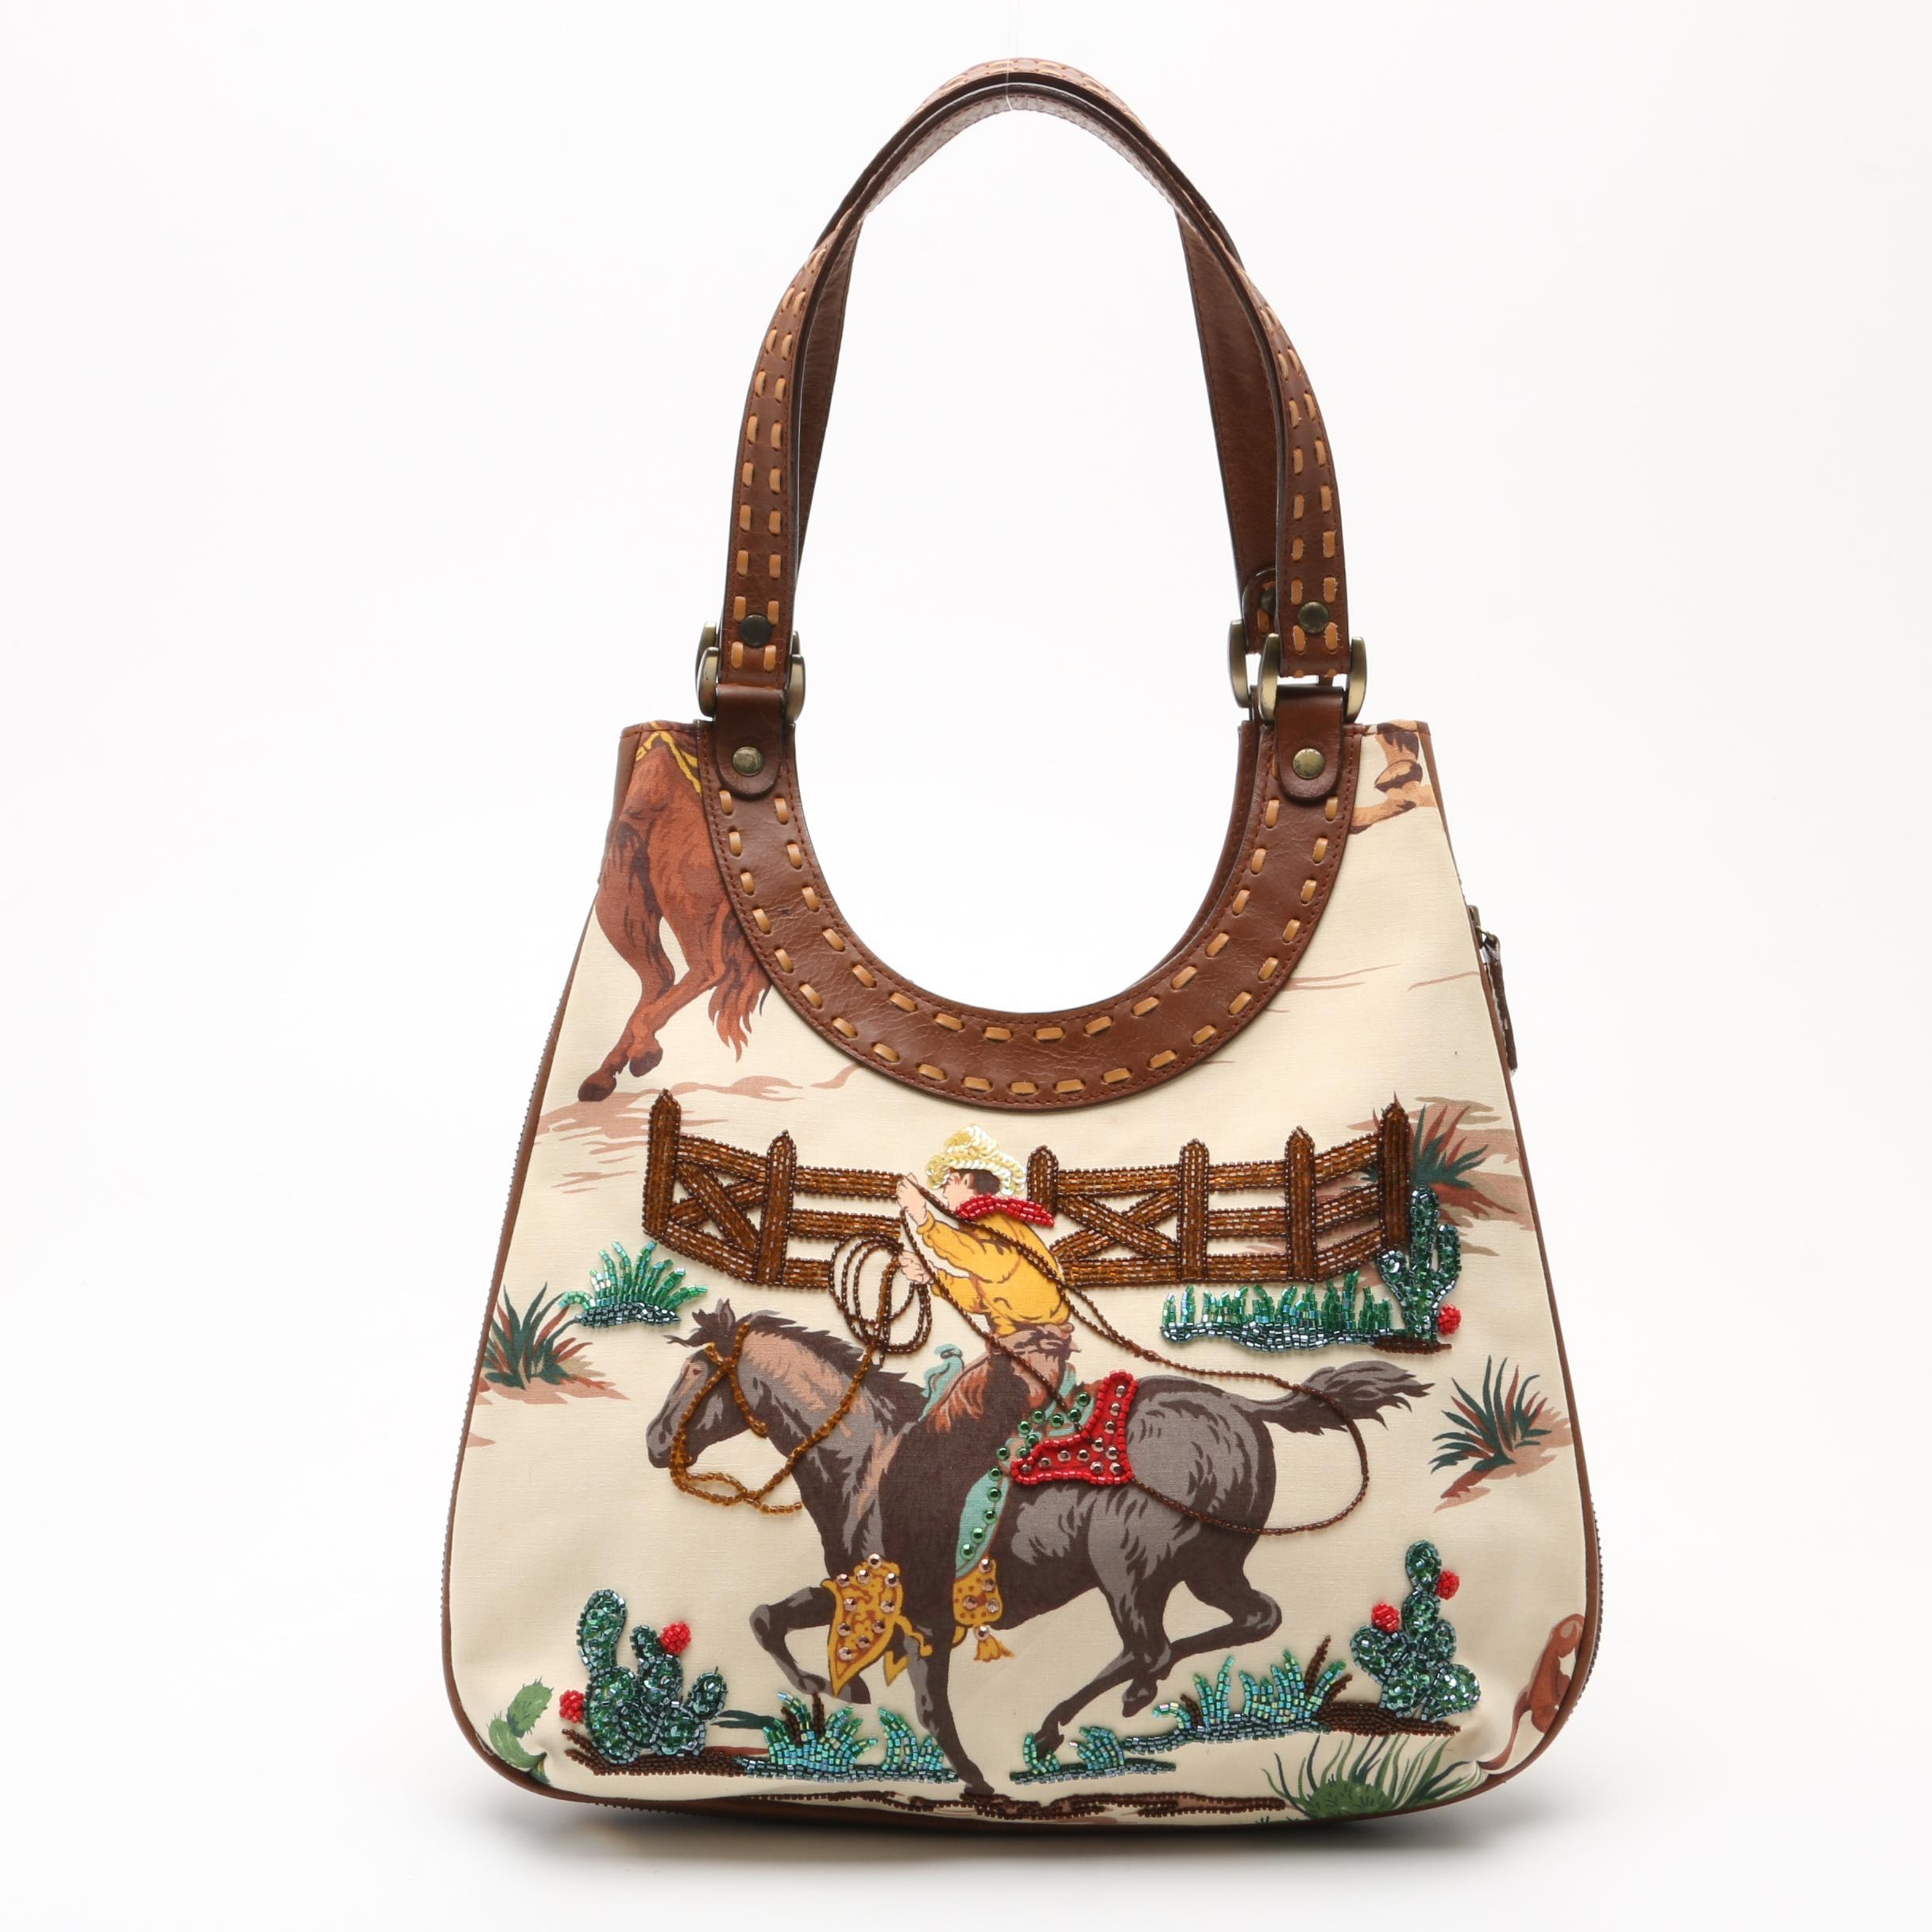 Isabella Fiore Cowboy Motif Shoulder Bag Embellished with Beads